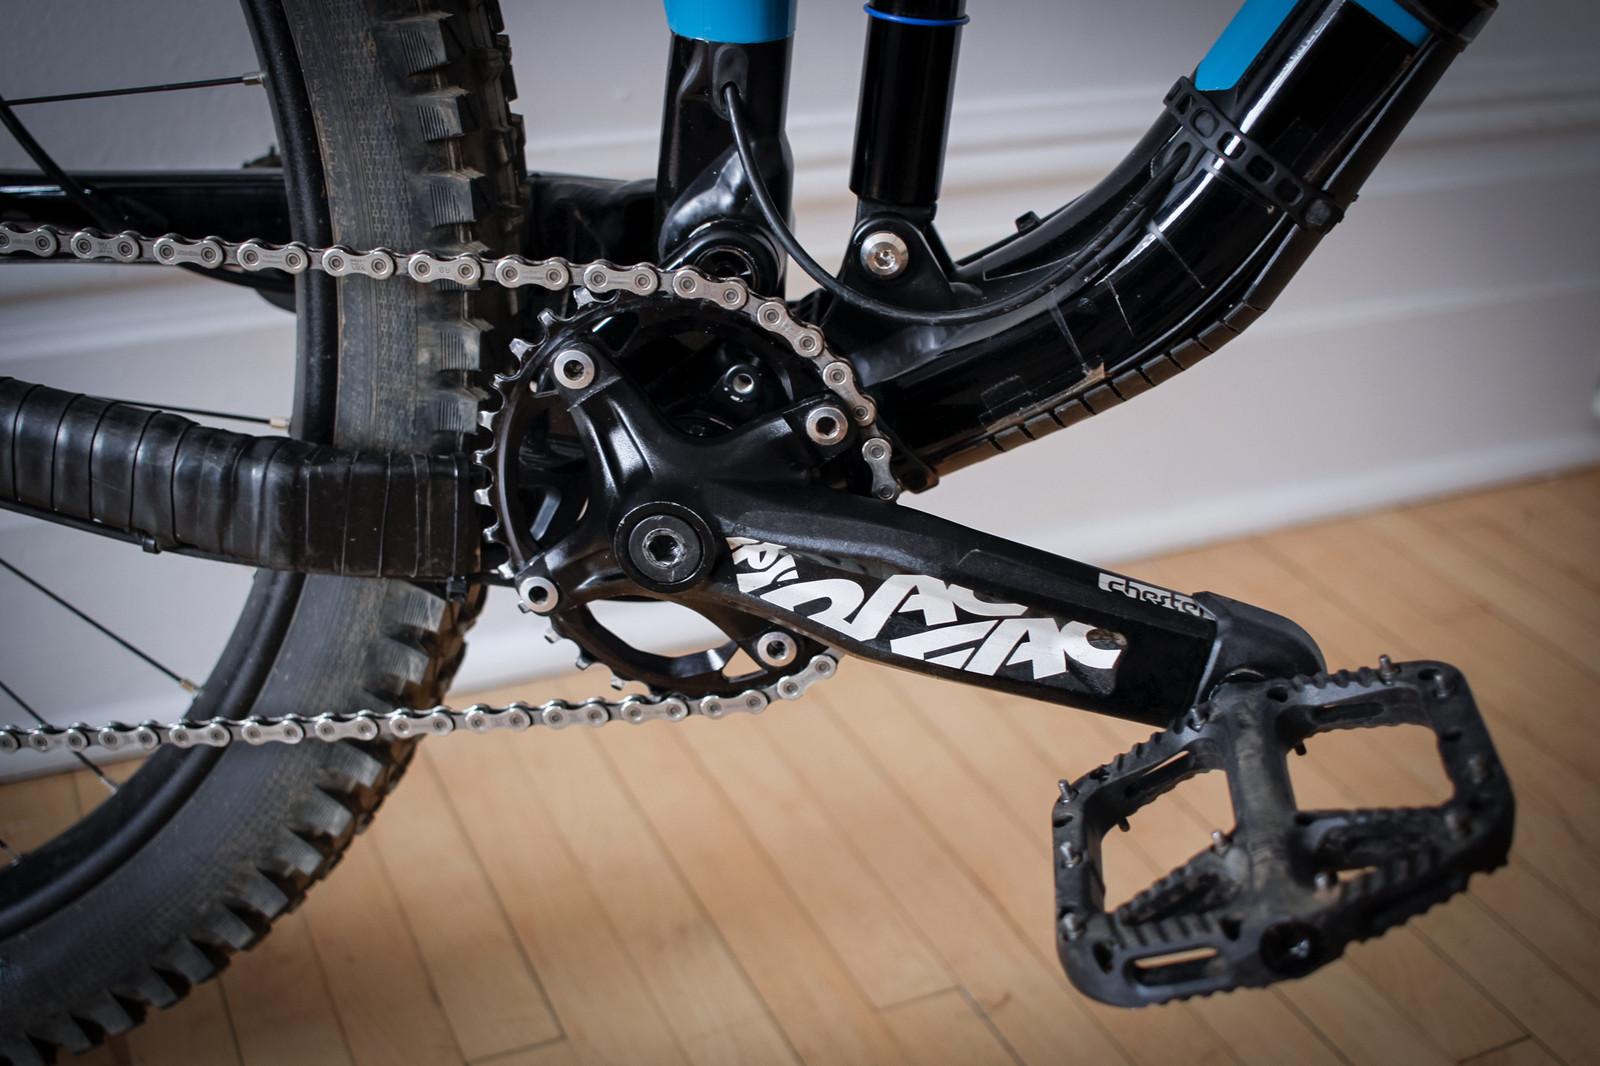 Timeless, sturdy cranks with great adjustability